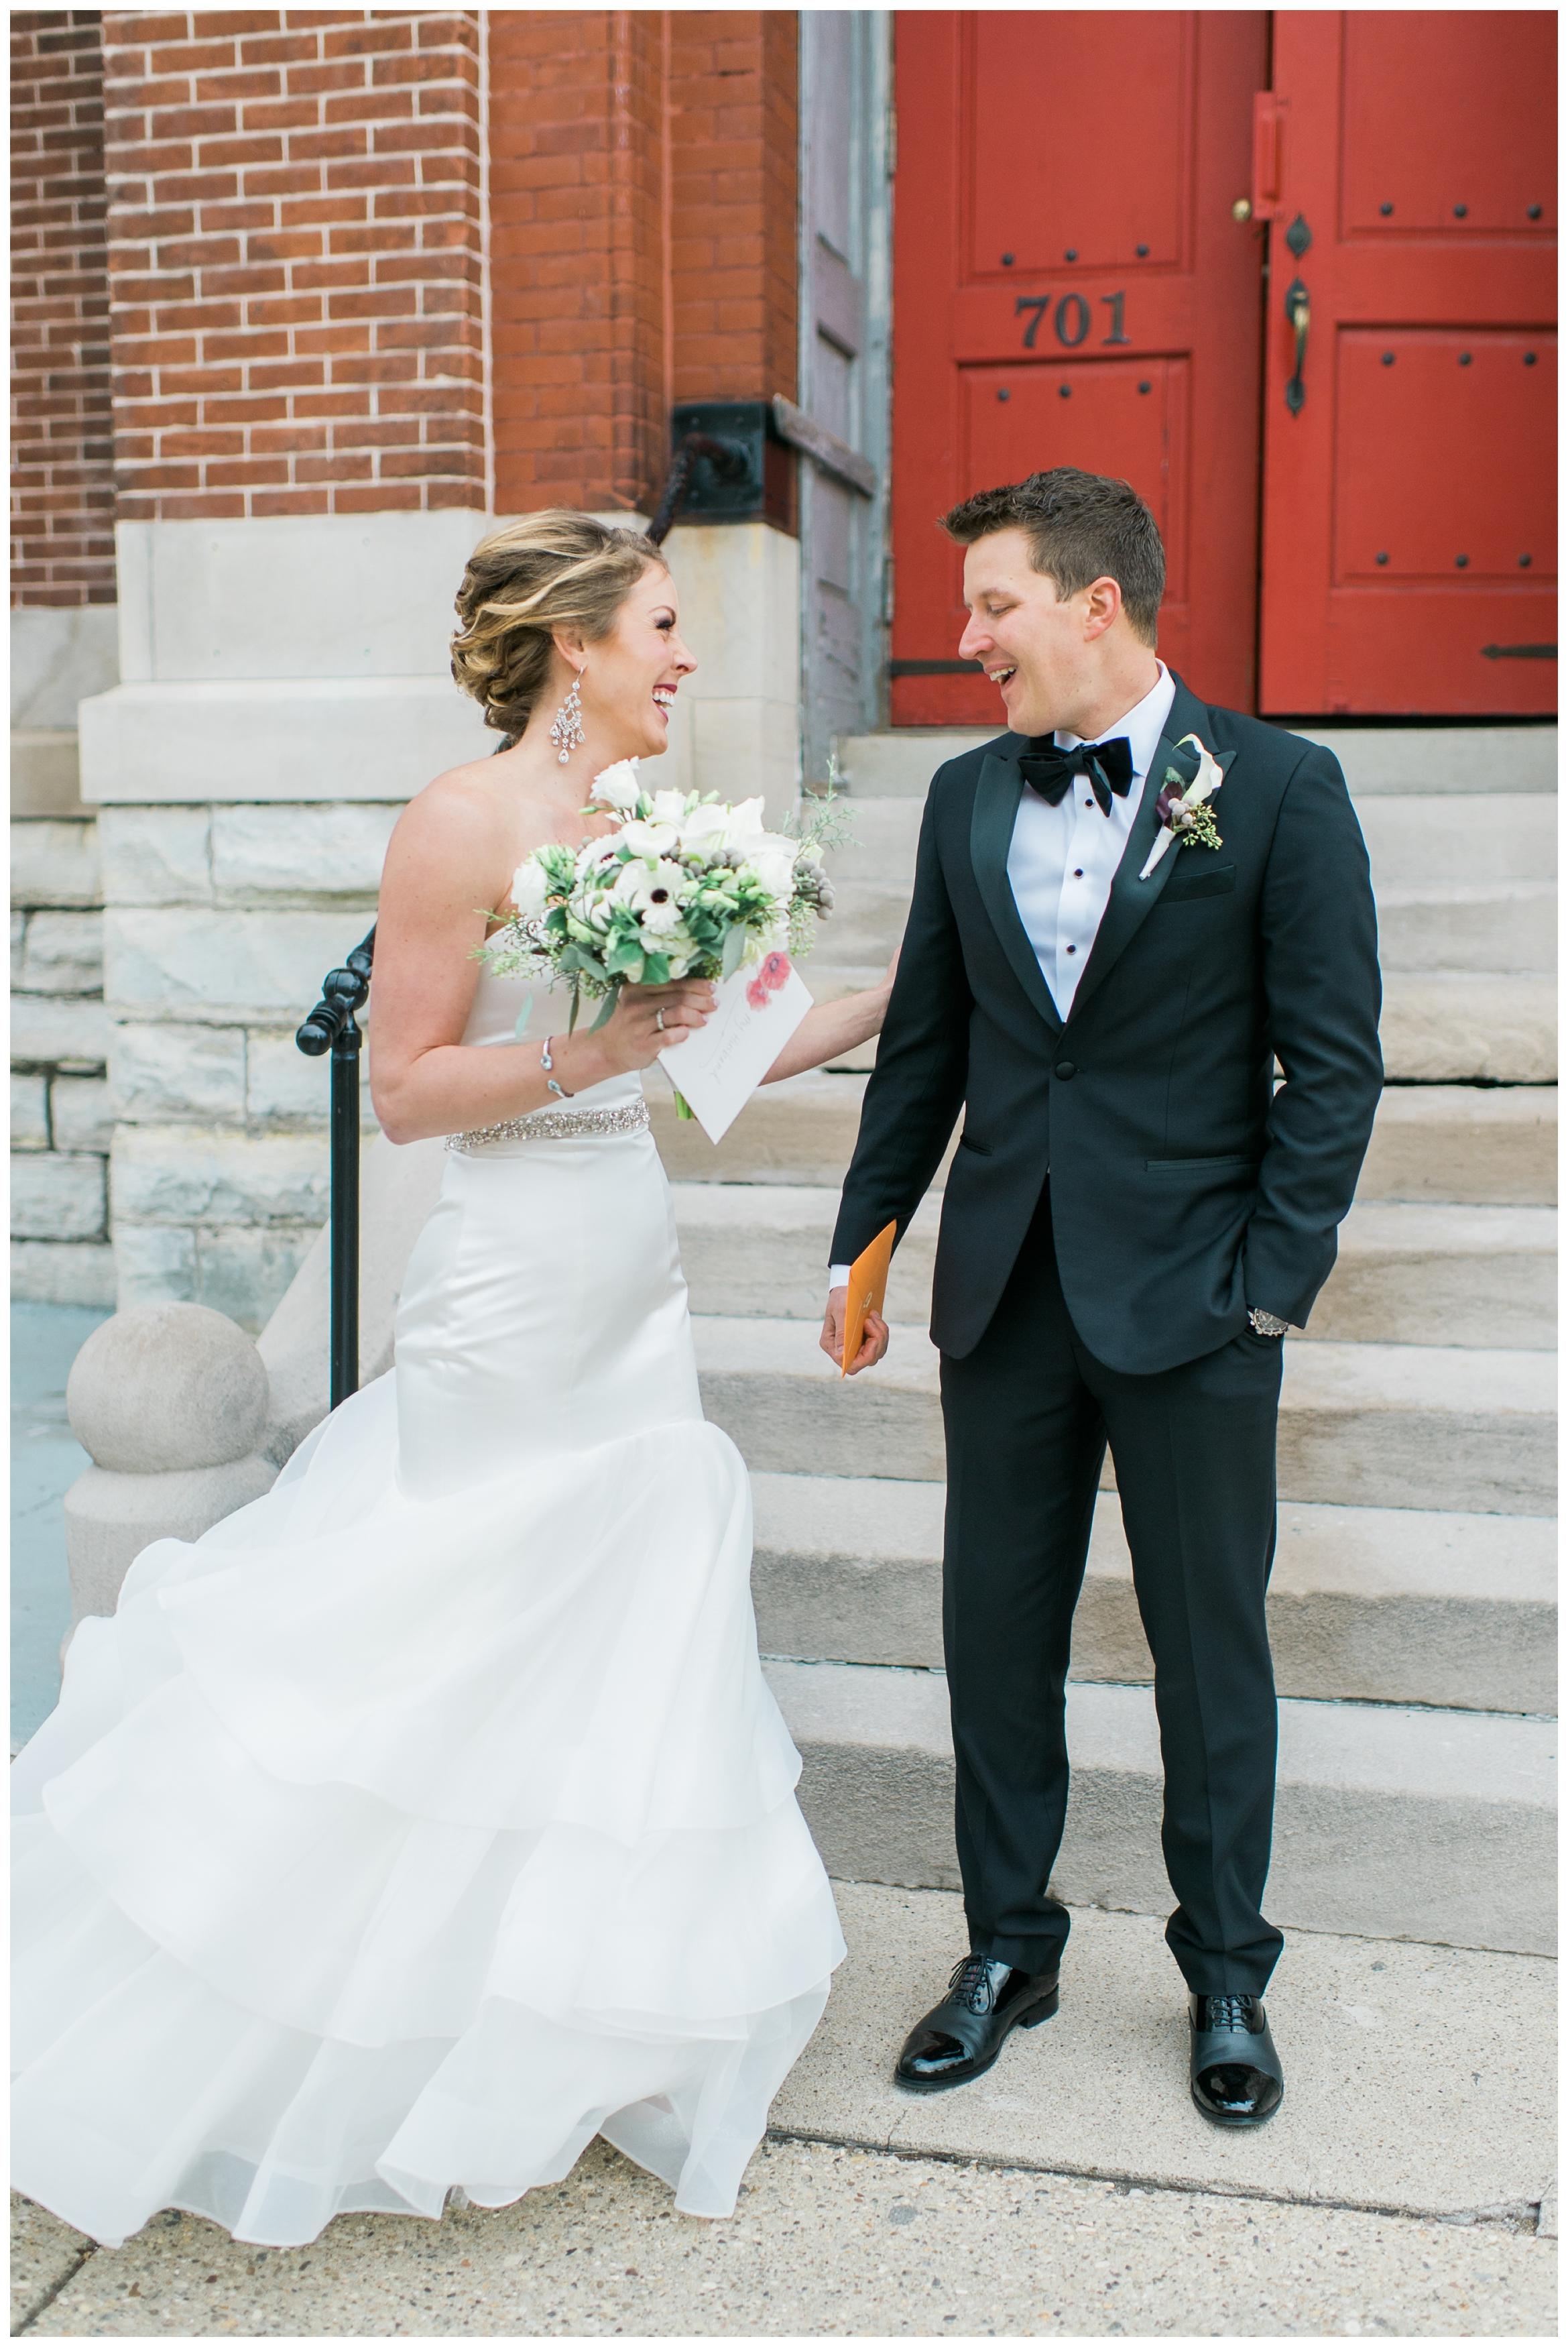 Rebecca_Bridges_Photography_Indianapolis_Wedding_Photographer_5792.jpg